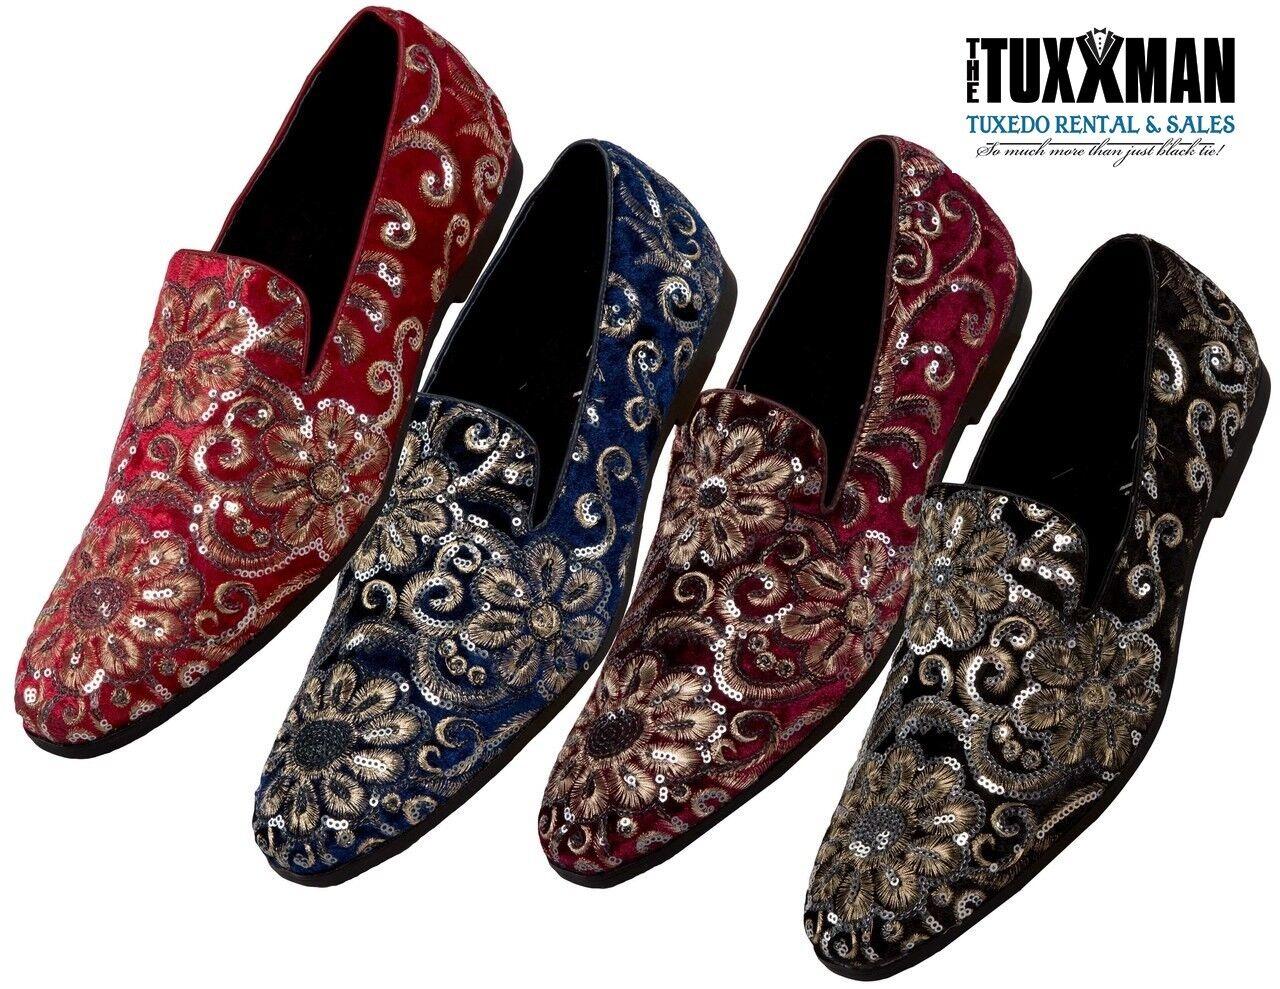 New Mens Sequin Embroidered Slip On Loafers TUXXMAN Smoking Slipper TUXEDO